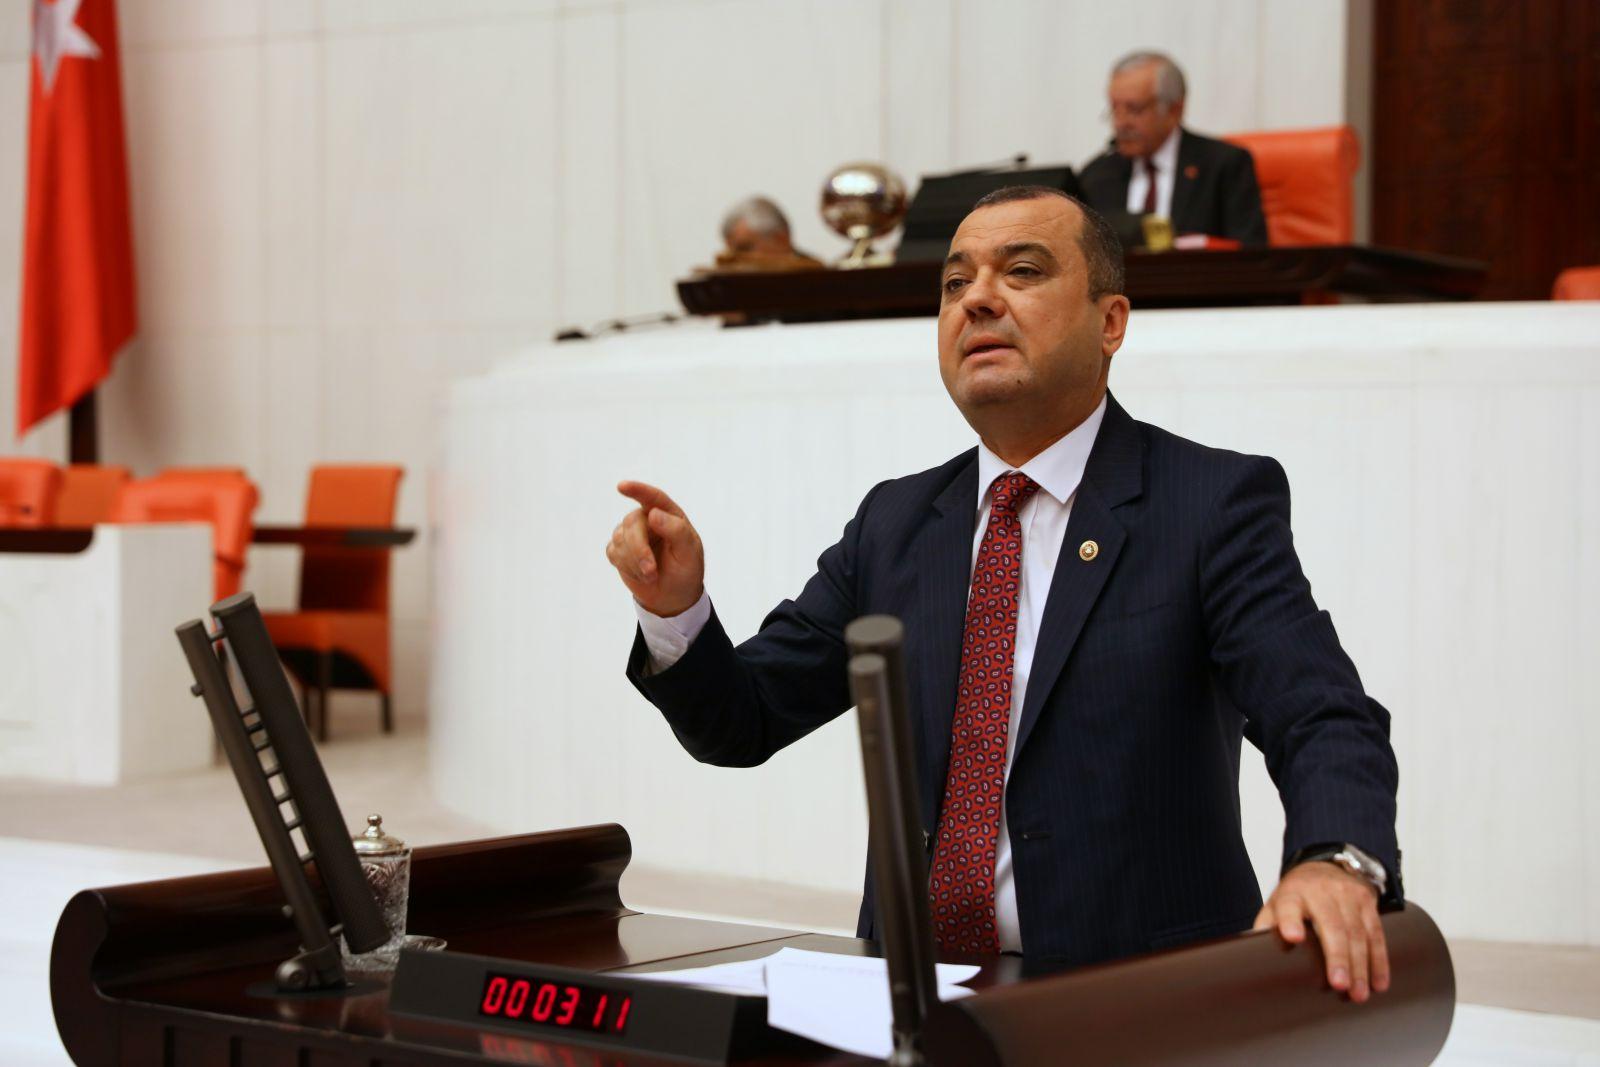 "CHP VEKİLİ AYGUN'DAN İŞ KANUNU'NA 3 MADDELİK ""KOVİD'DEN KORUNMA AYARI""  TALEBİ"